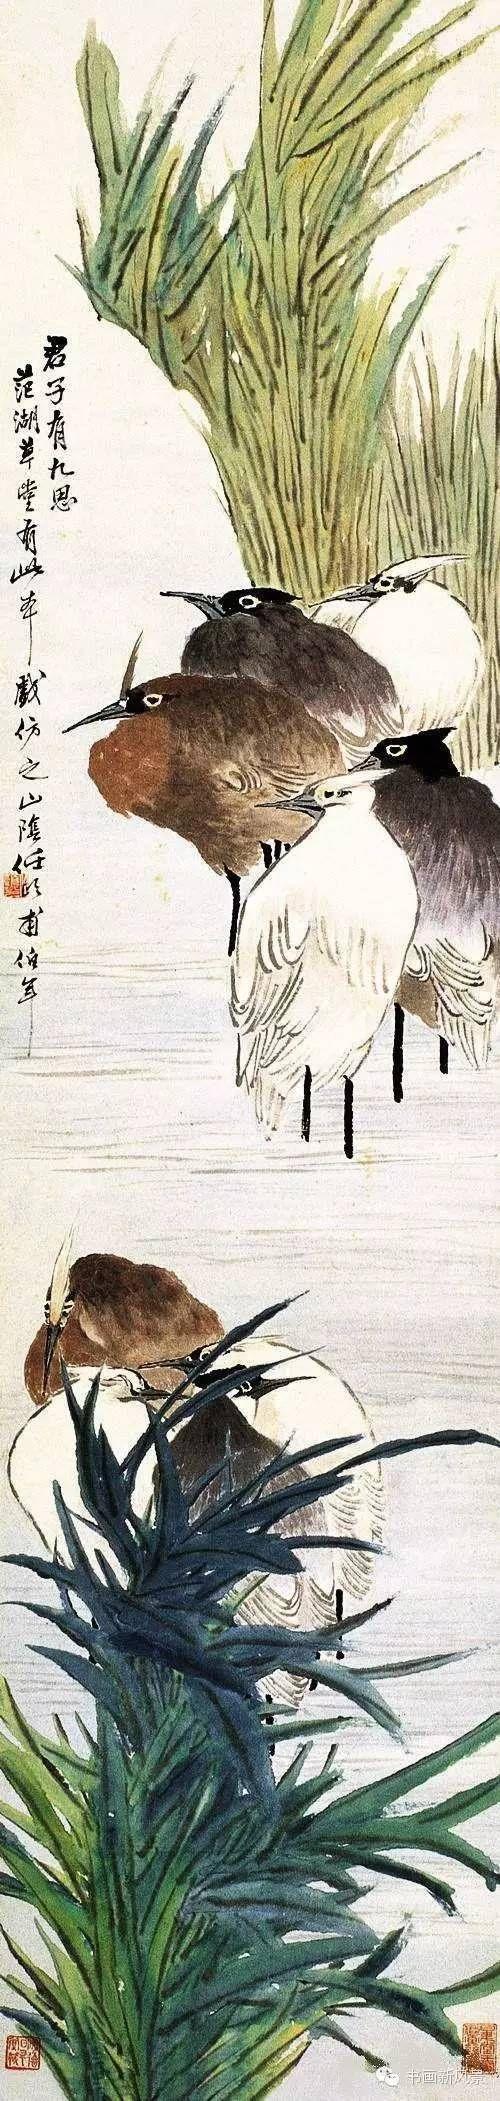 Watercolor art history brush -  20 Japanese Calligraphycalligraphy Artchinese Brushchinese